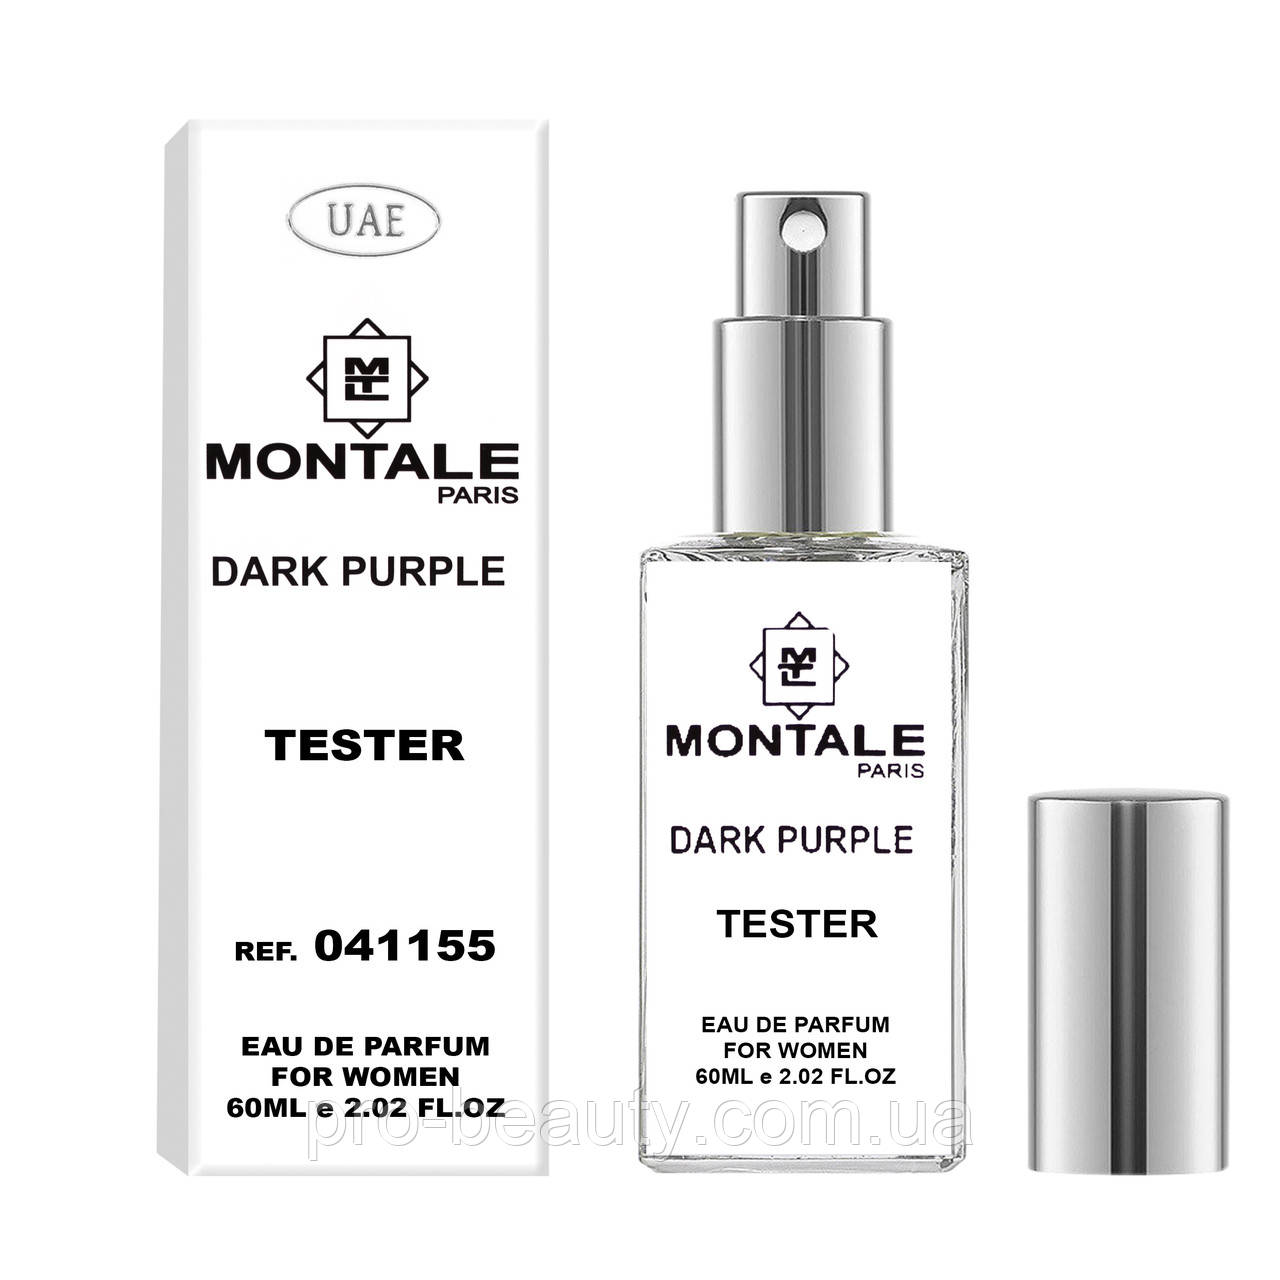 Тестер женский UAE Montale Dark Purple, 60 мл.